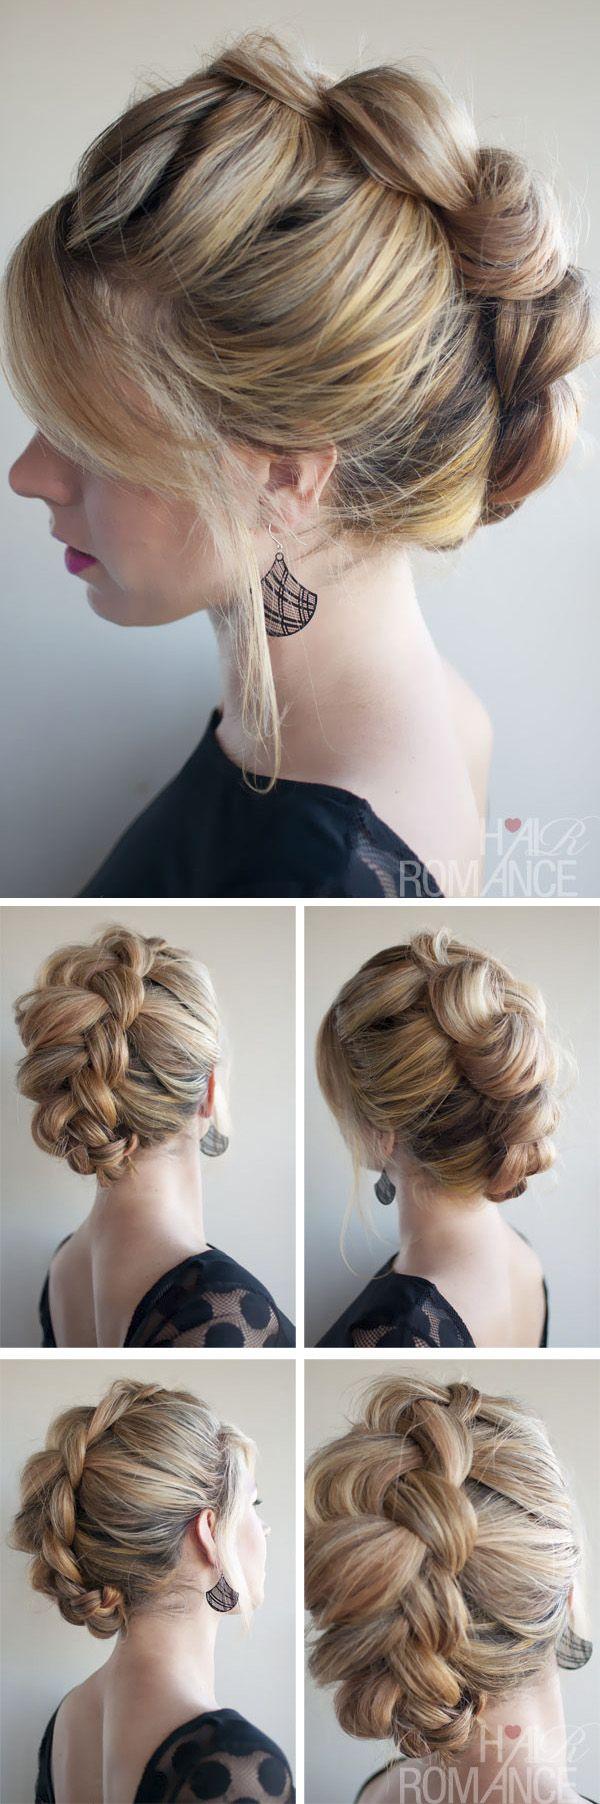 Phenomenal 1000 Ideas About French Braid Mohawk On Pinterest Braided Short Hairstyles Gunalazisus